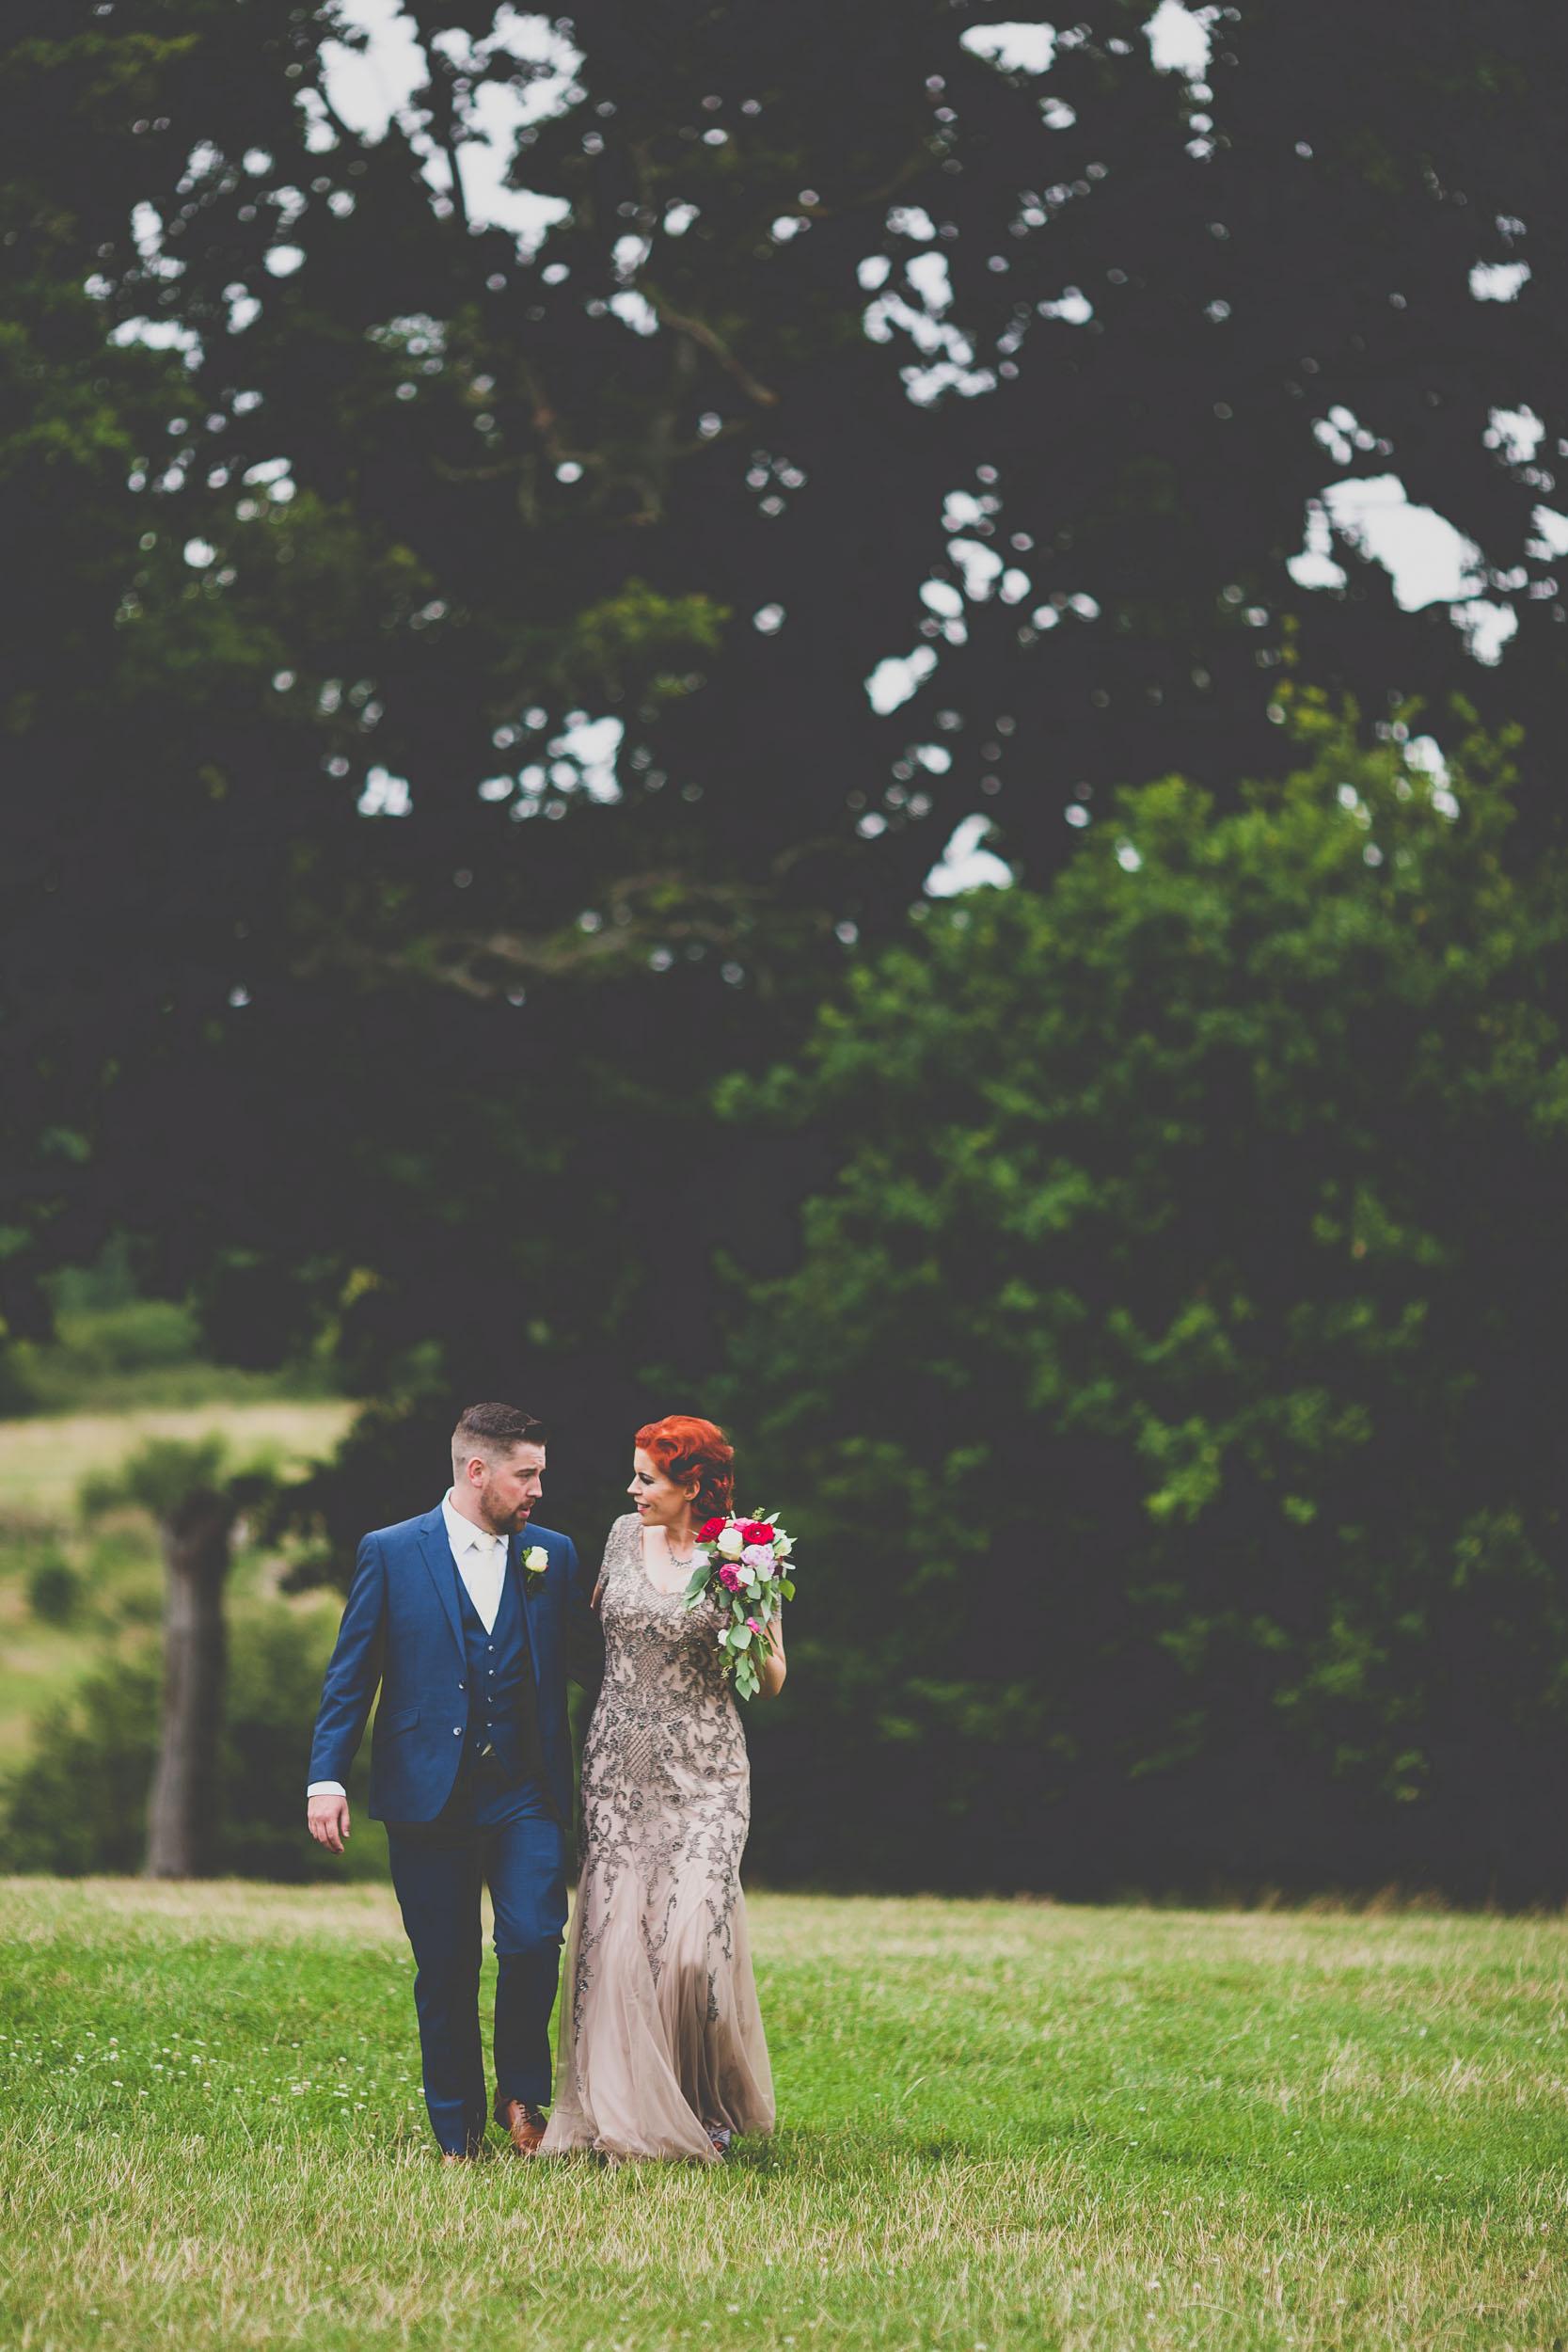 queen-elizabeths-hunting-lodge-epping-forest-wedding199.jpg